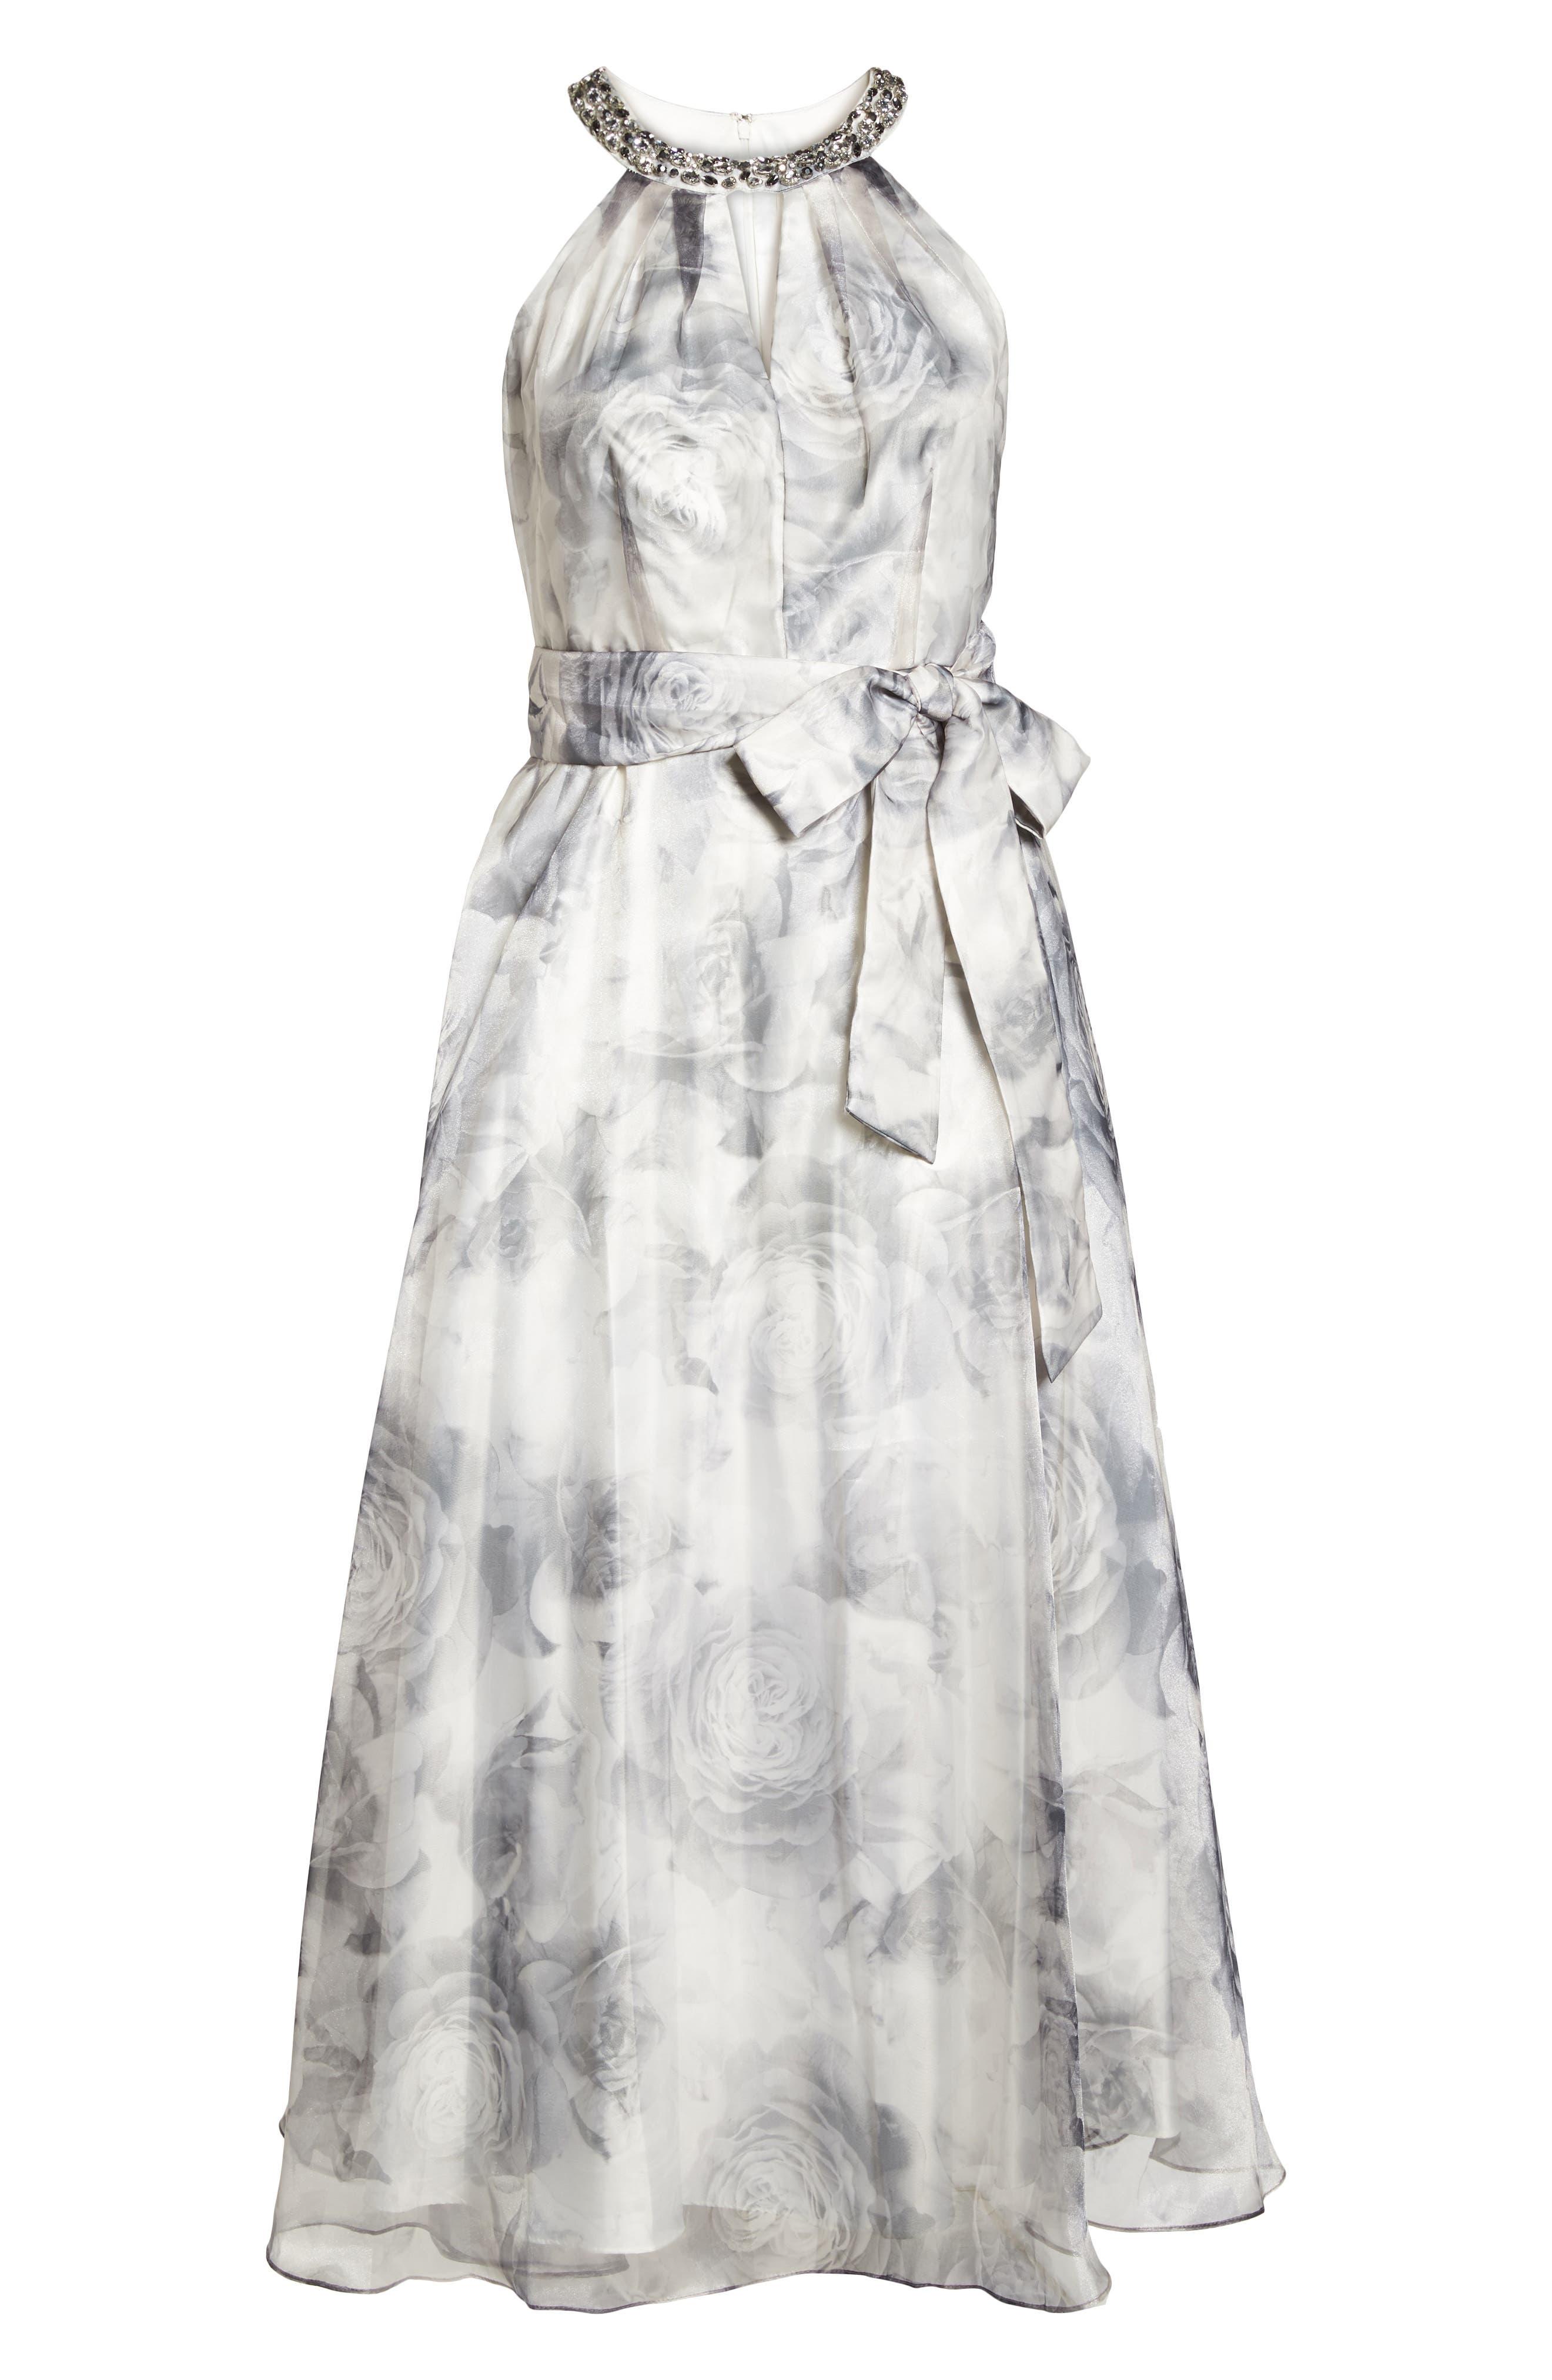 Embellished Neck Rose Print Ballgown,                             Alternate thumbnail 6, color,                             Black/ White